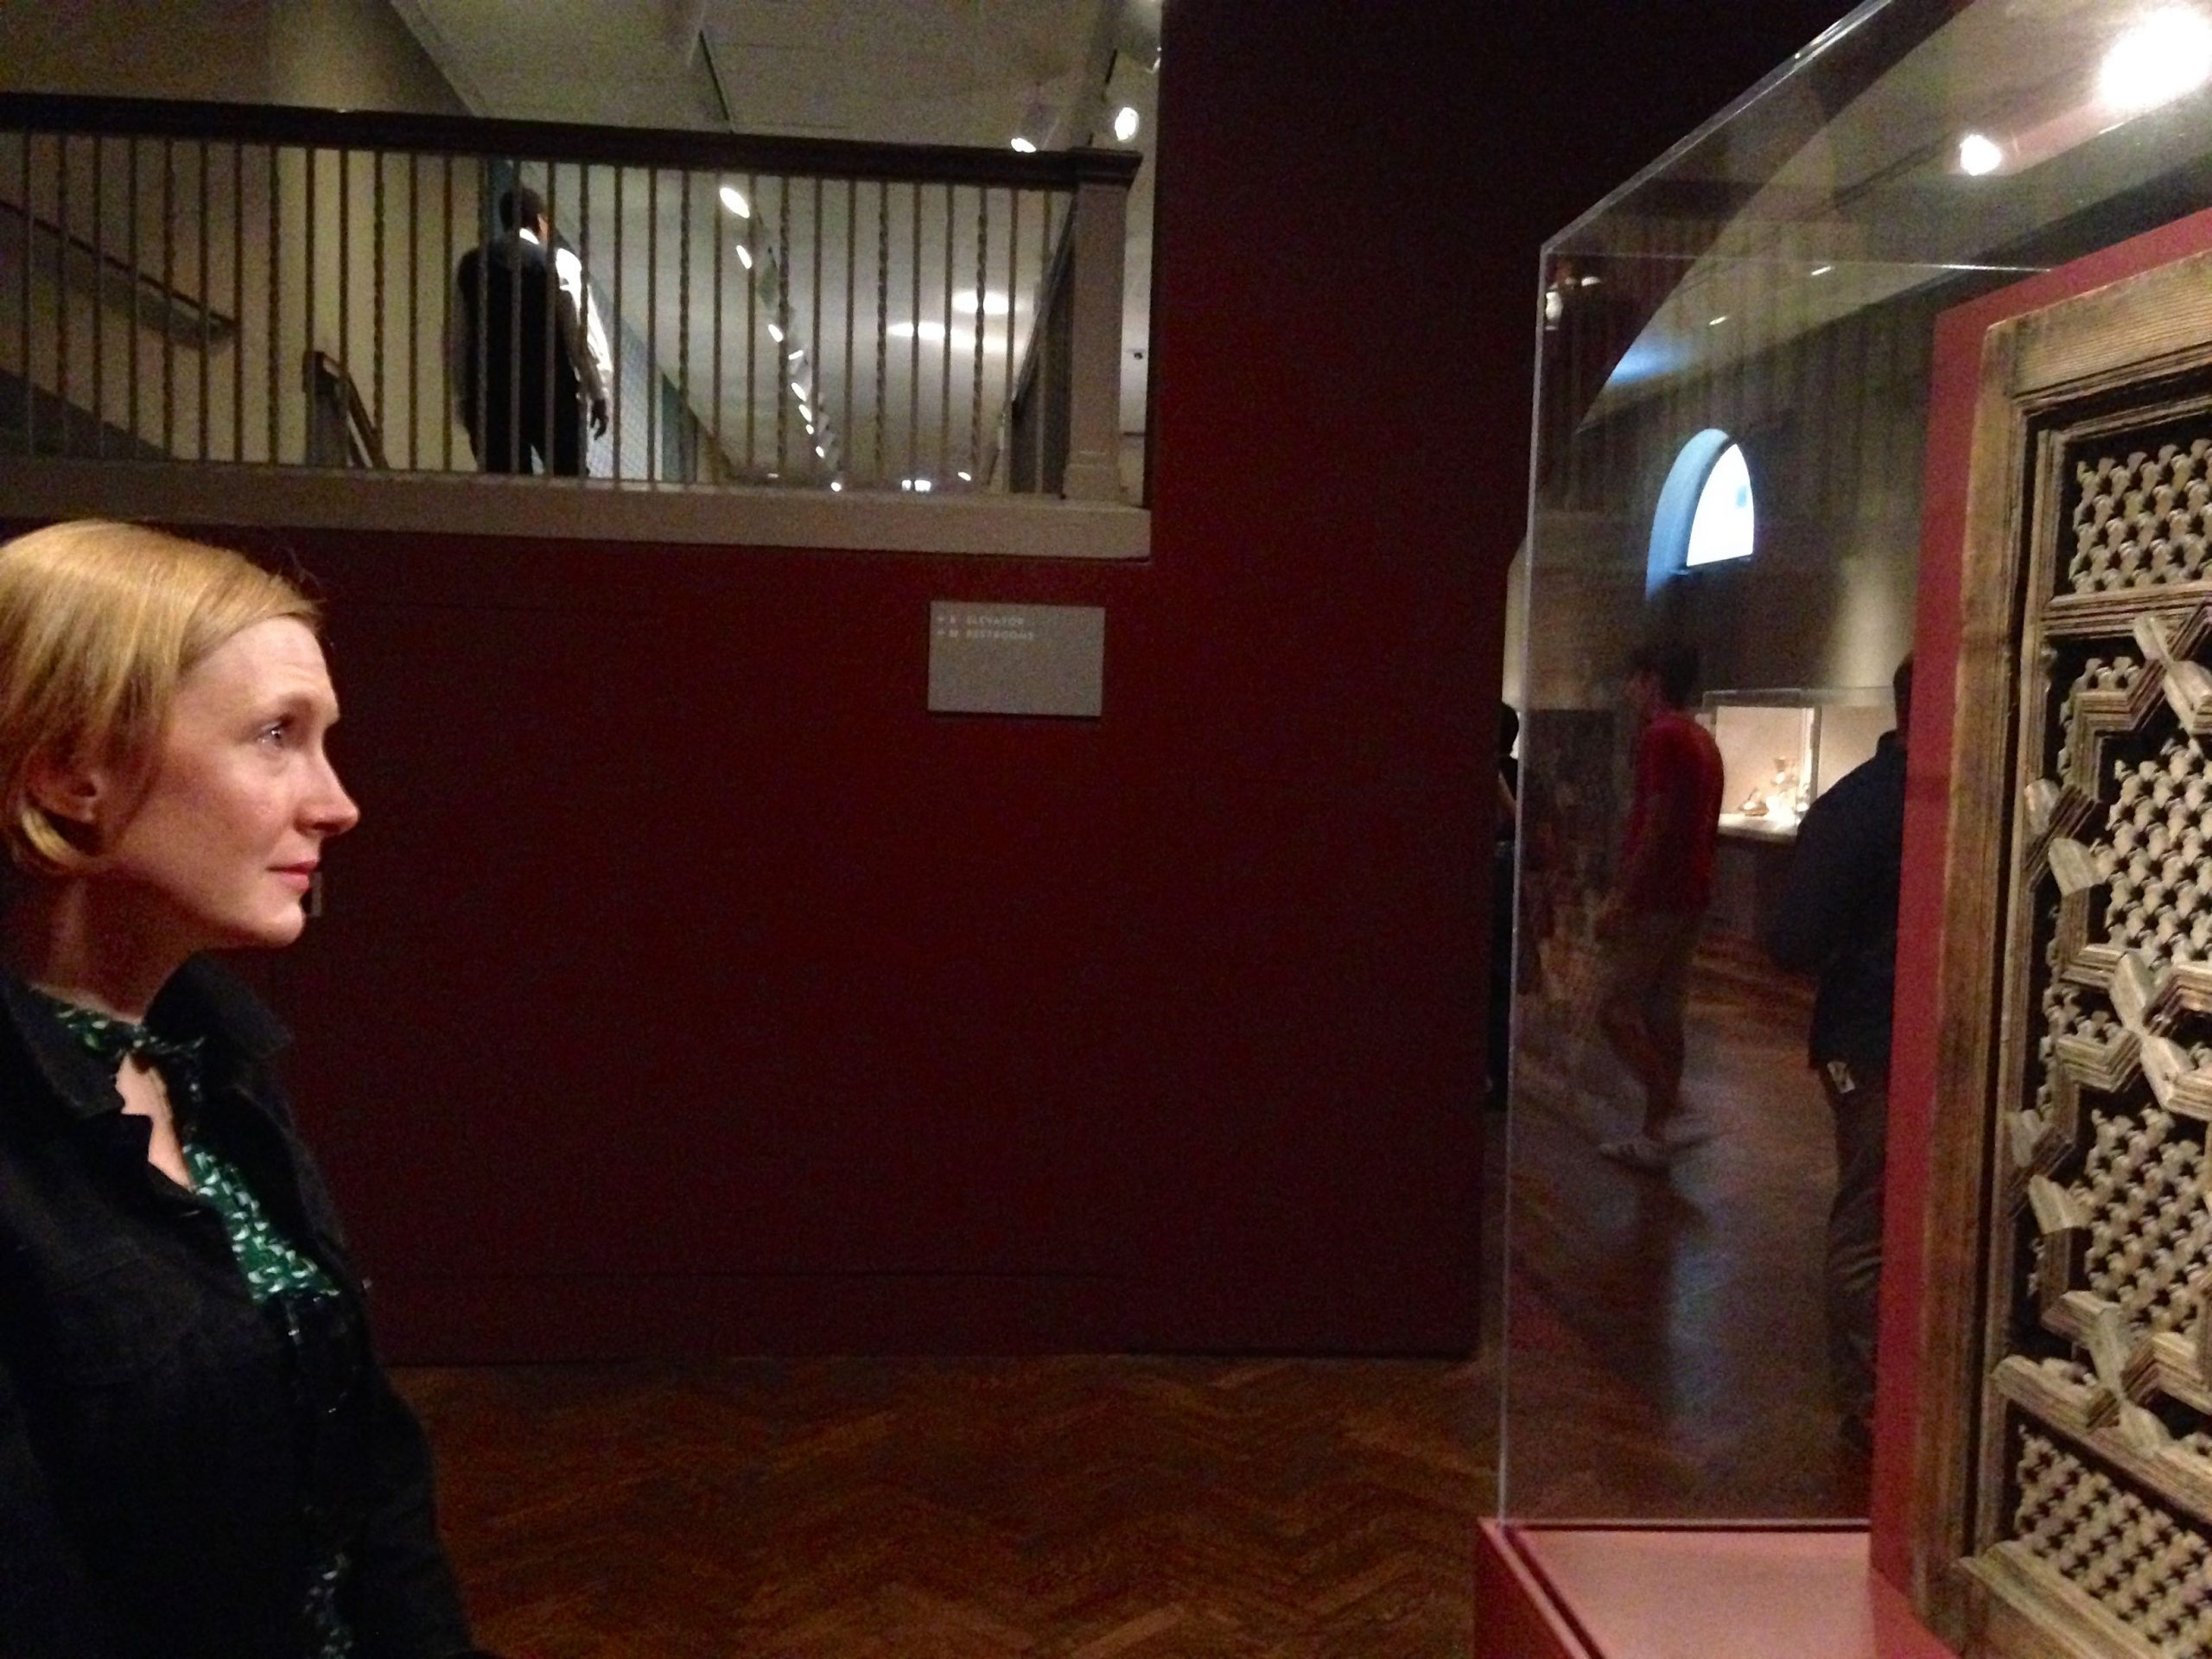 Nisi Sturgis looks at an Islamic screen.